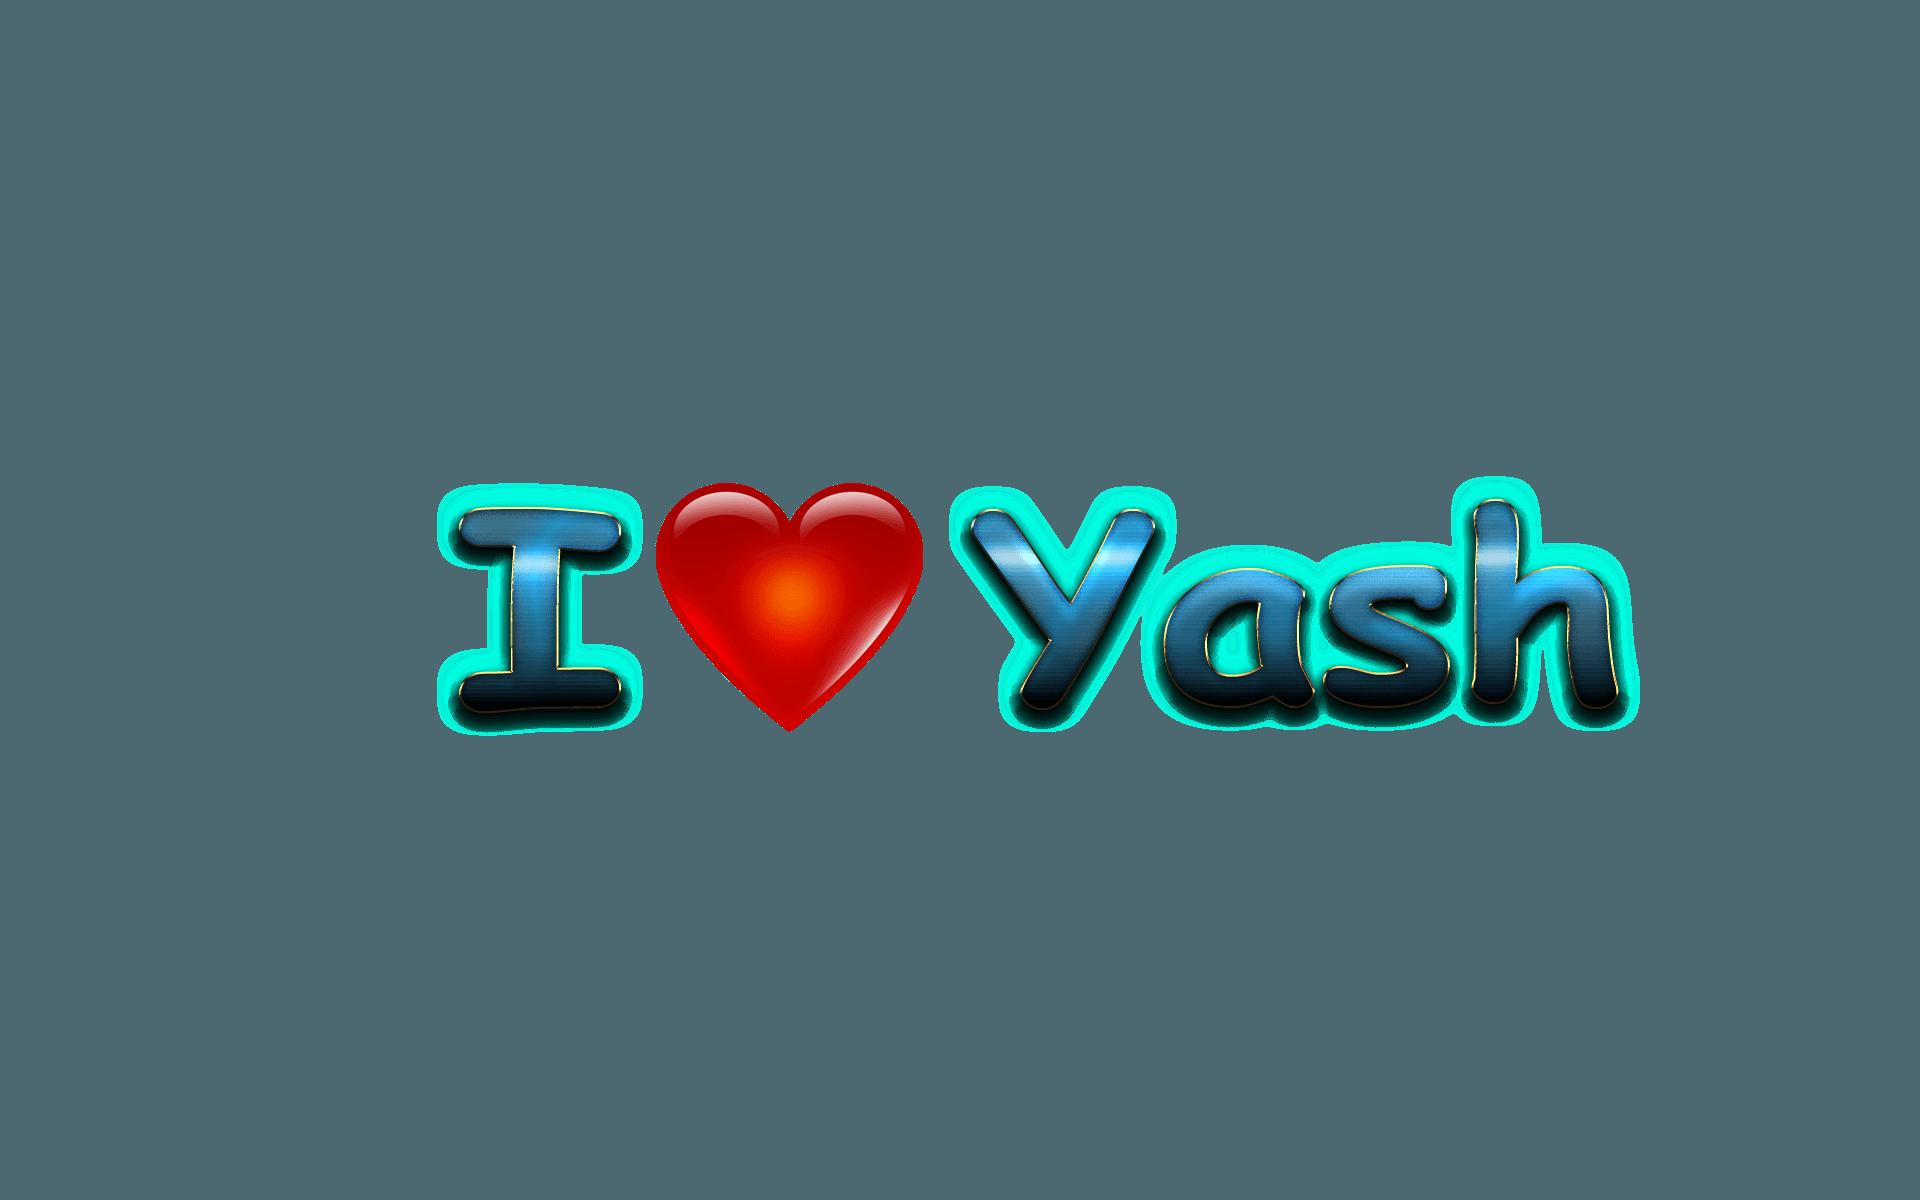 Popular Wallpaper Name Yash - wp2496669  You Should Have_28180.png